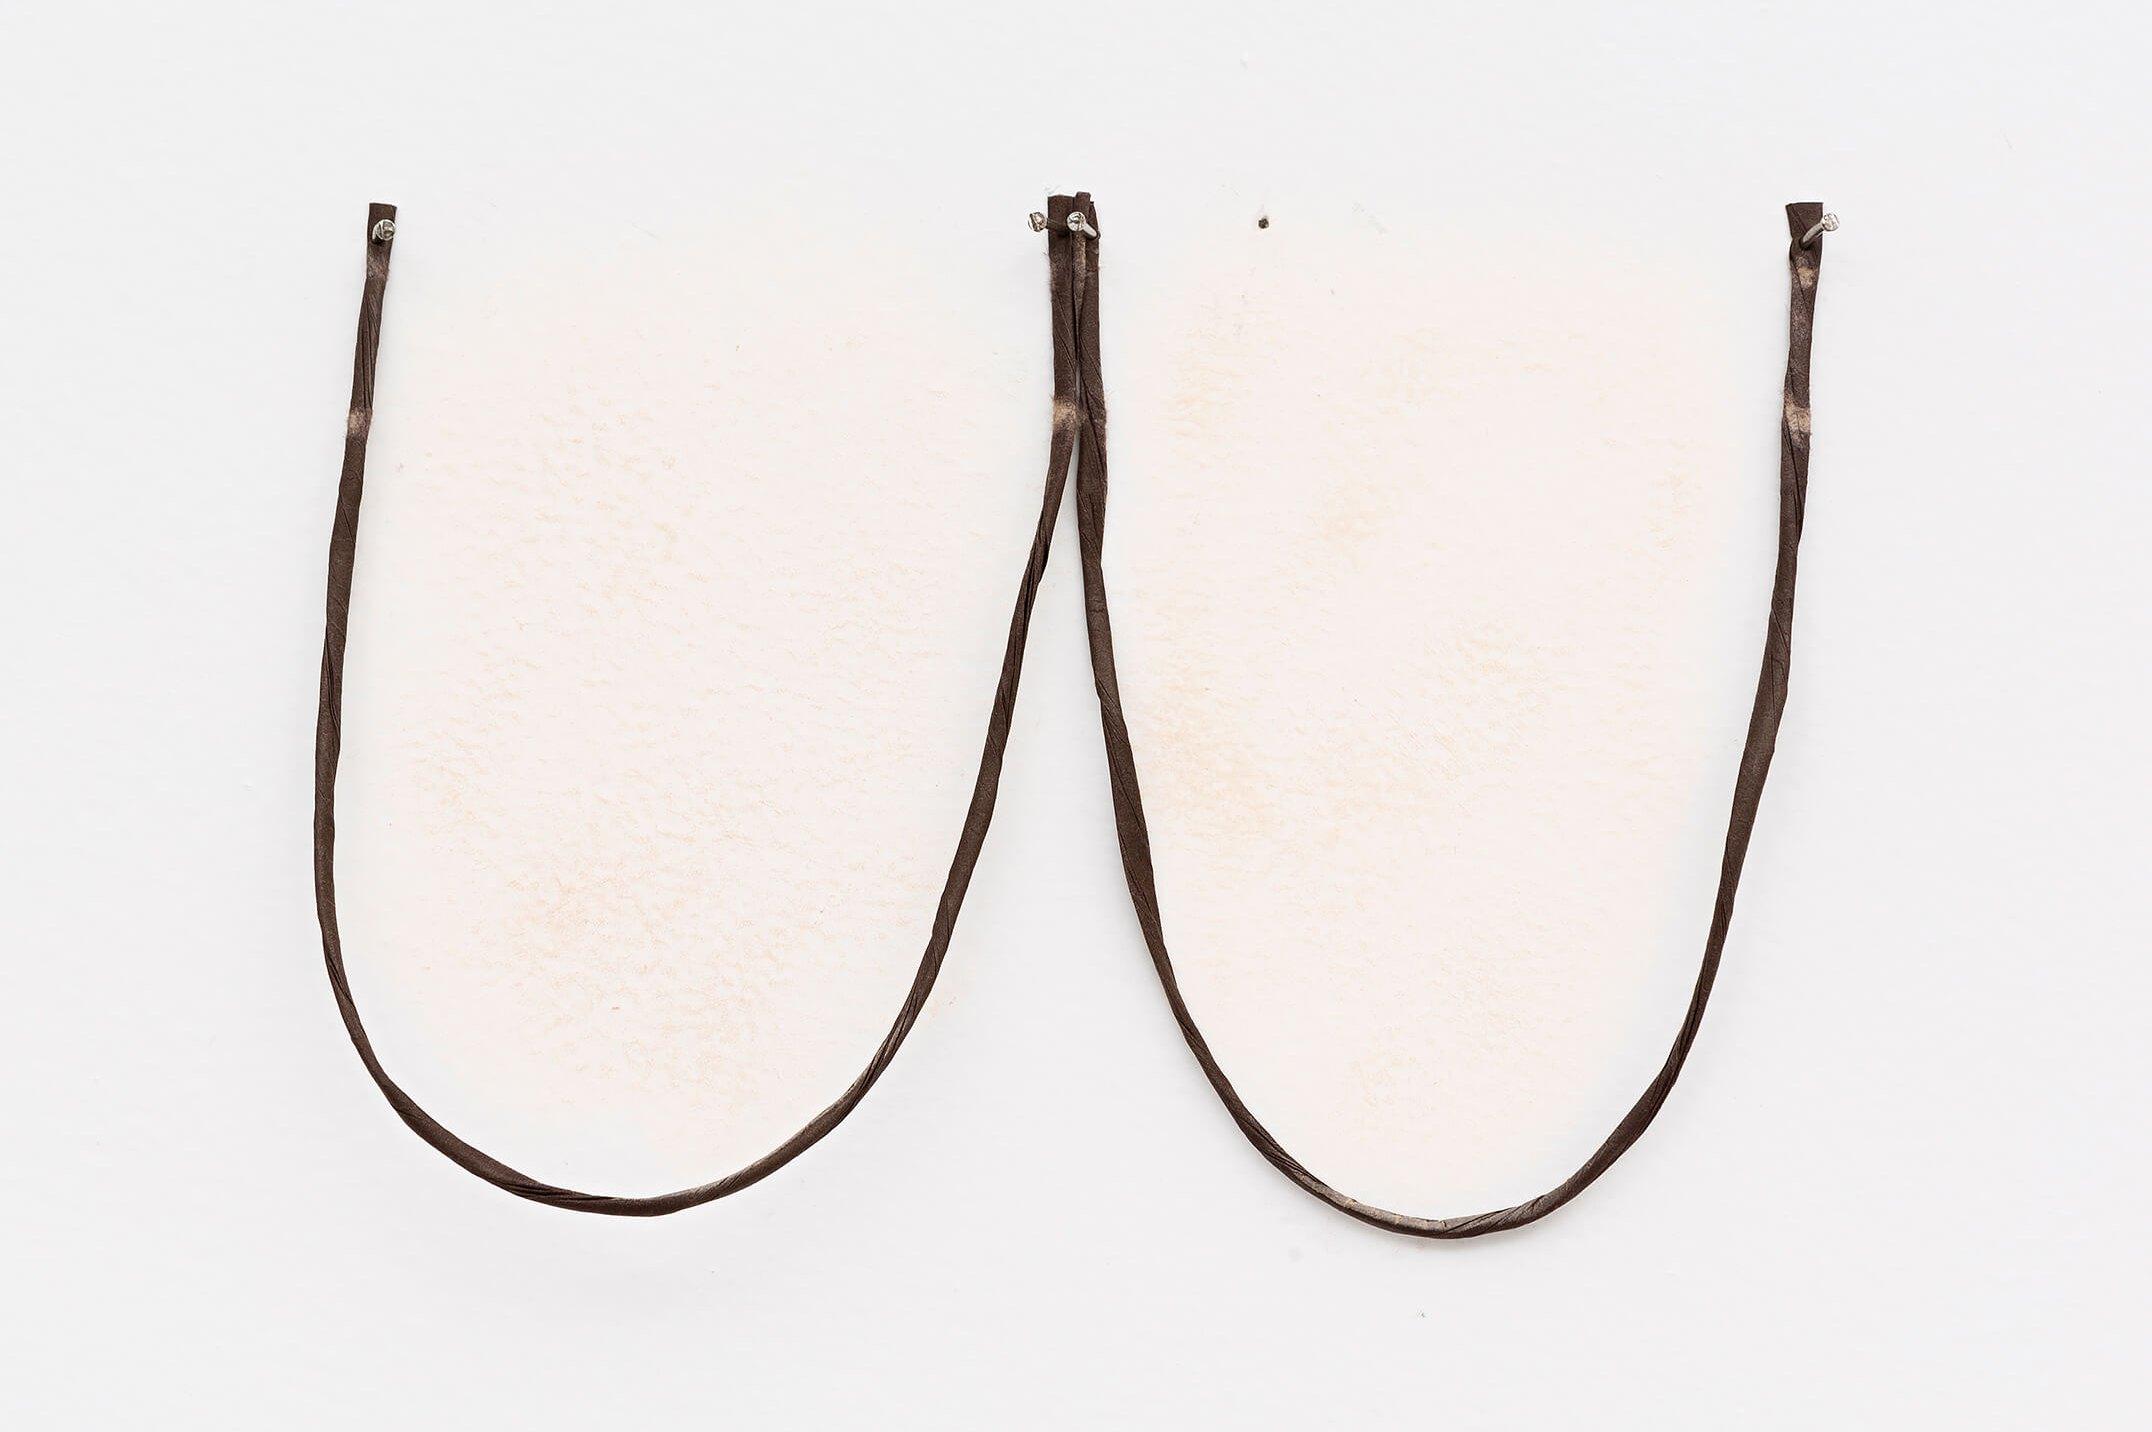 Adriano Costa,<em> MAC Balls</em>, 2015, MAC NC37 foudation and bag strap, 12 × 22 cm - Mendes Wood DM